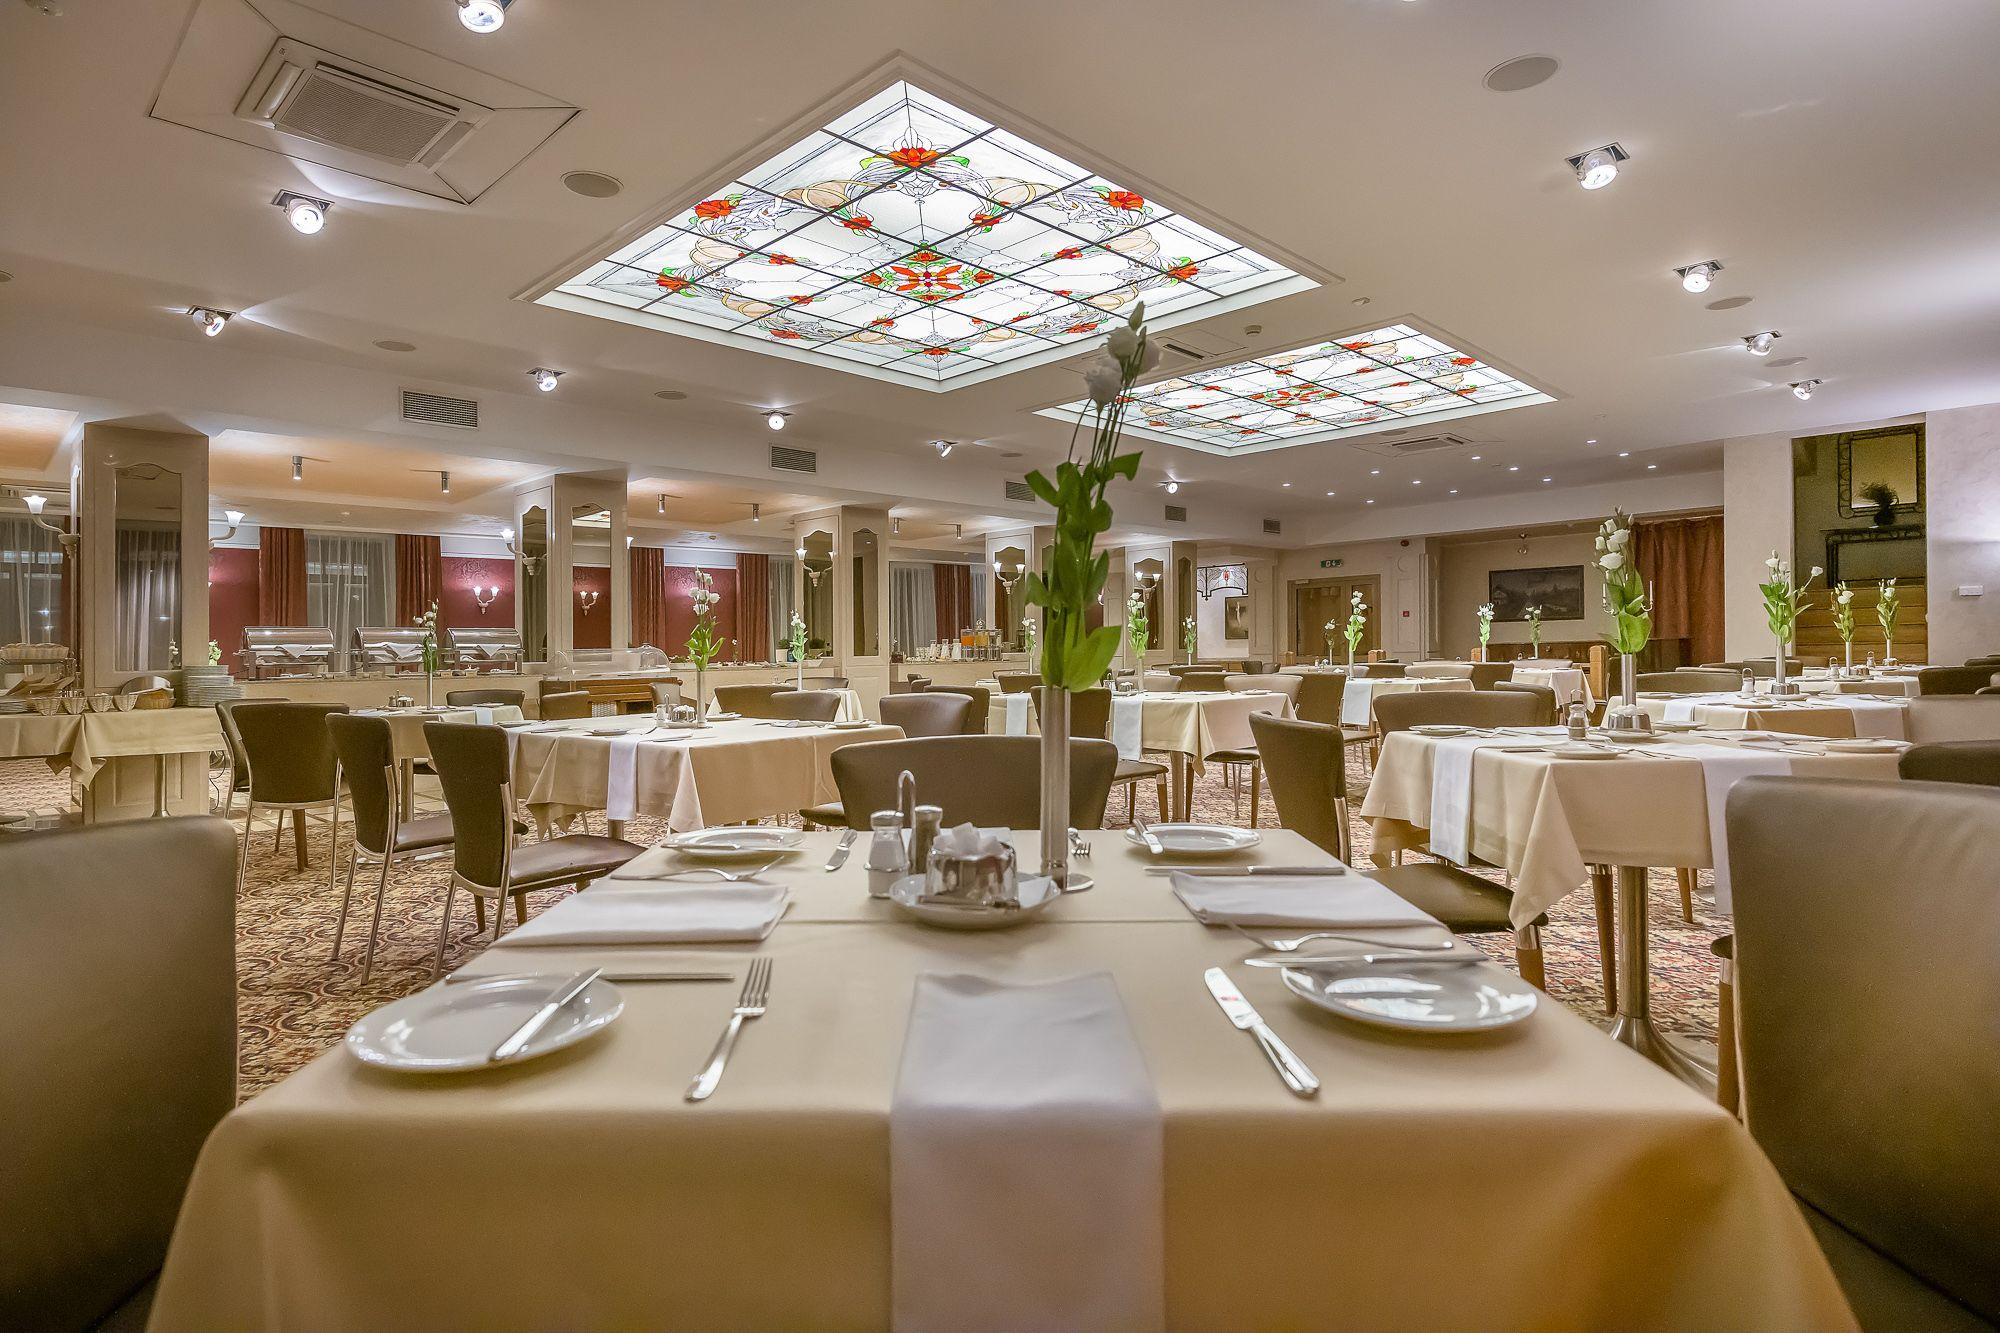 Artis Hotel Restaurant